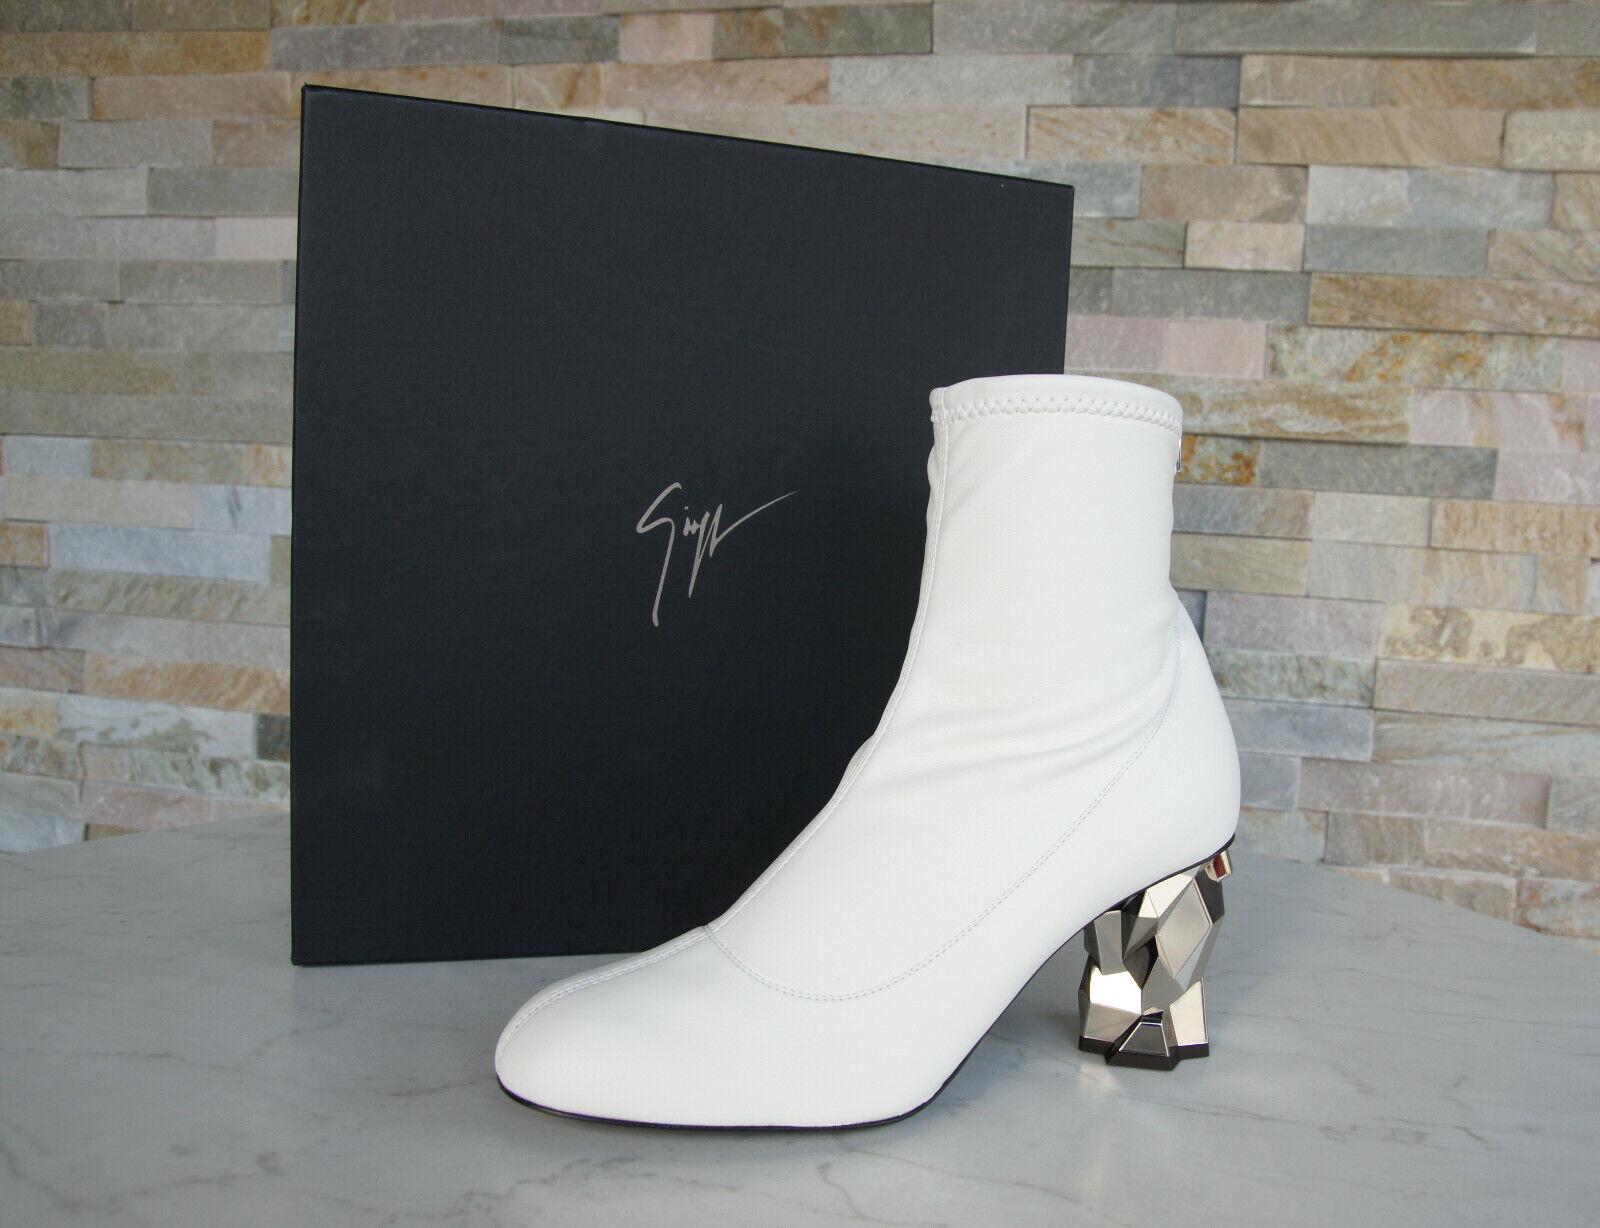 Luxus Giuseppe Zanotti Gr 37,5 Stiefeletten Stiefelies Schuhe weiss ehem